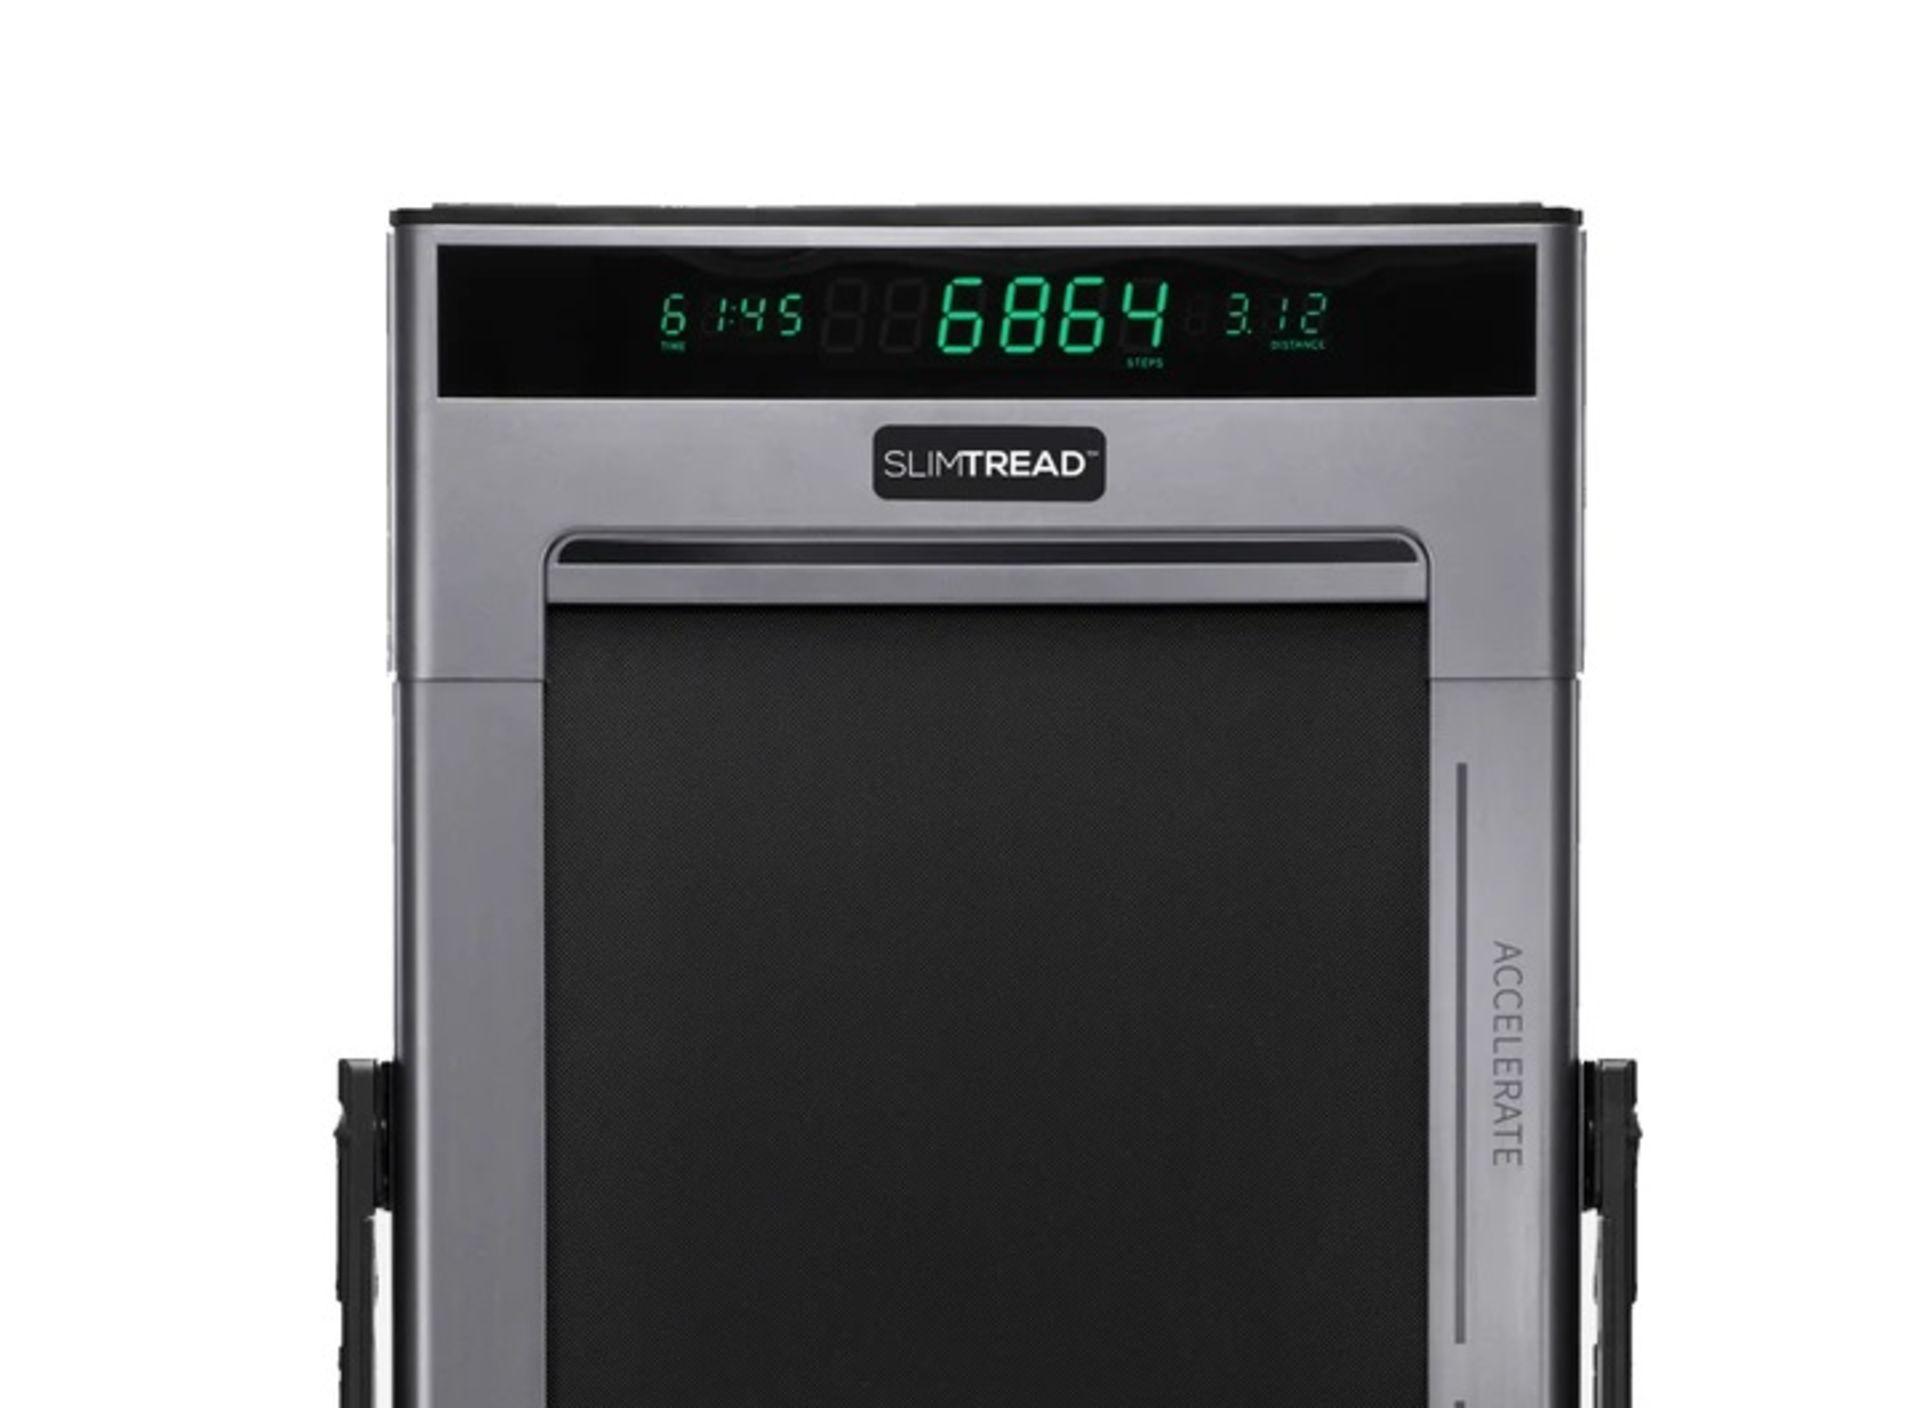 1 x Slim Tread Ultra Thin Smart Treadmill Running / Walking Machine - Lightweight With Folding - Image 4 of 19